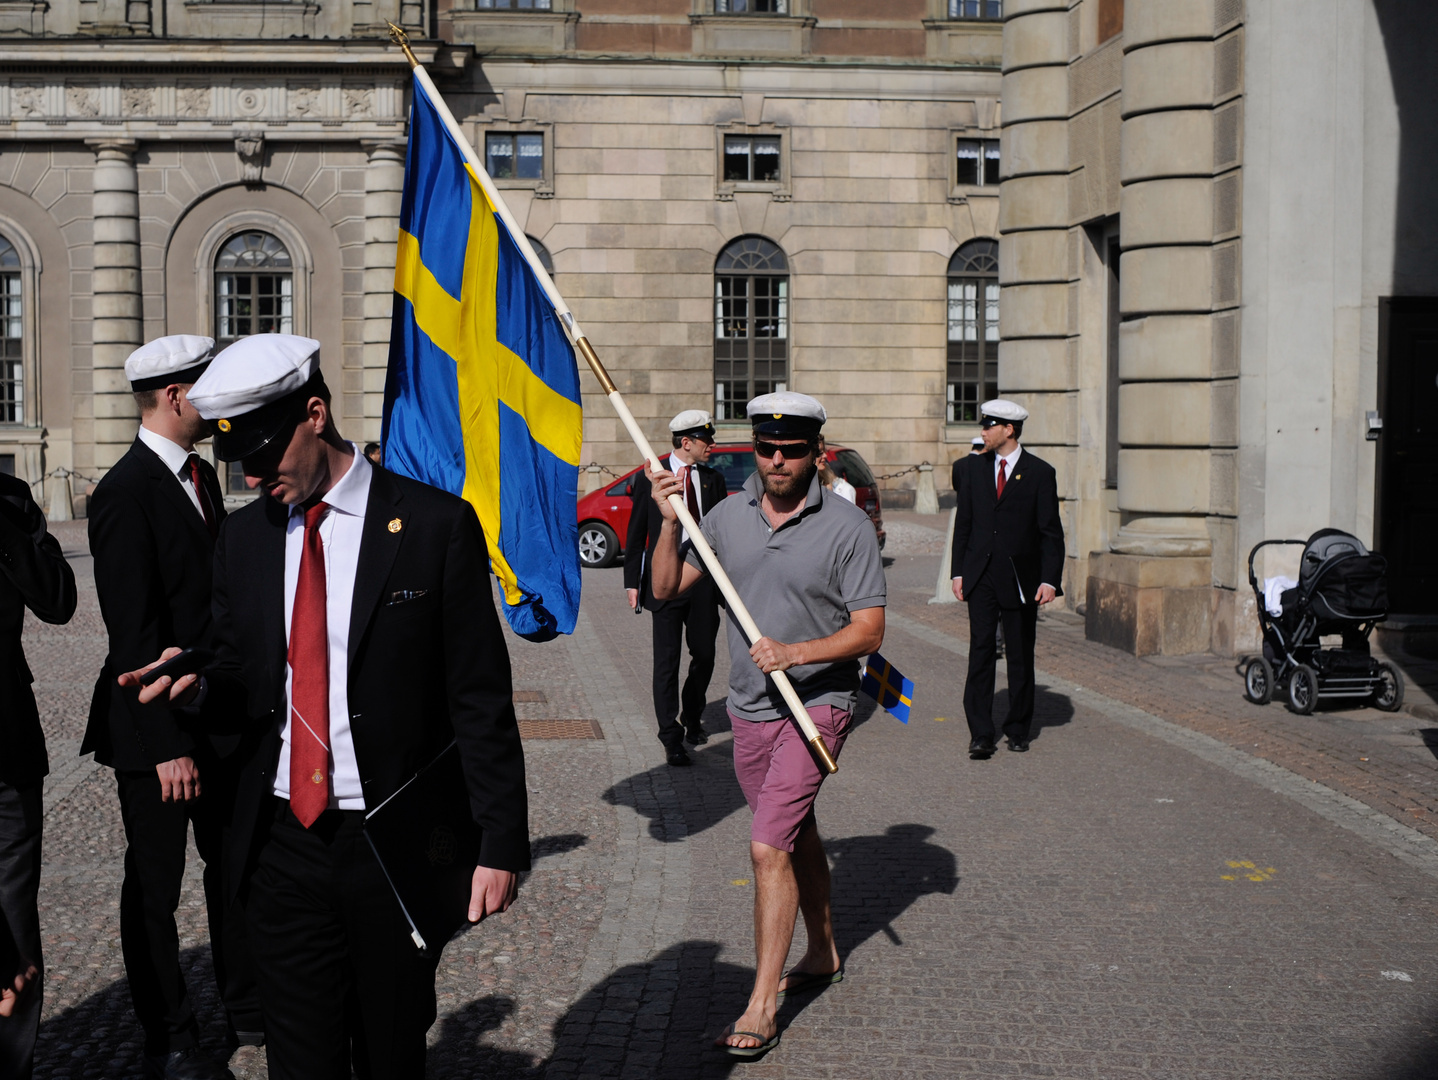 DAY 4:  Stockholm